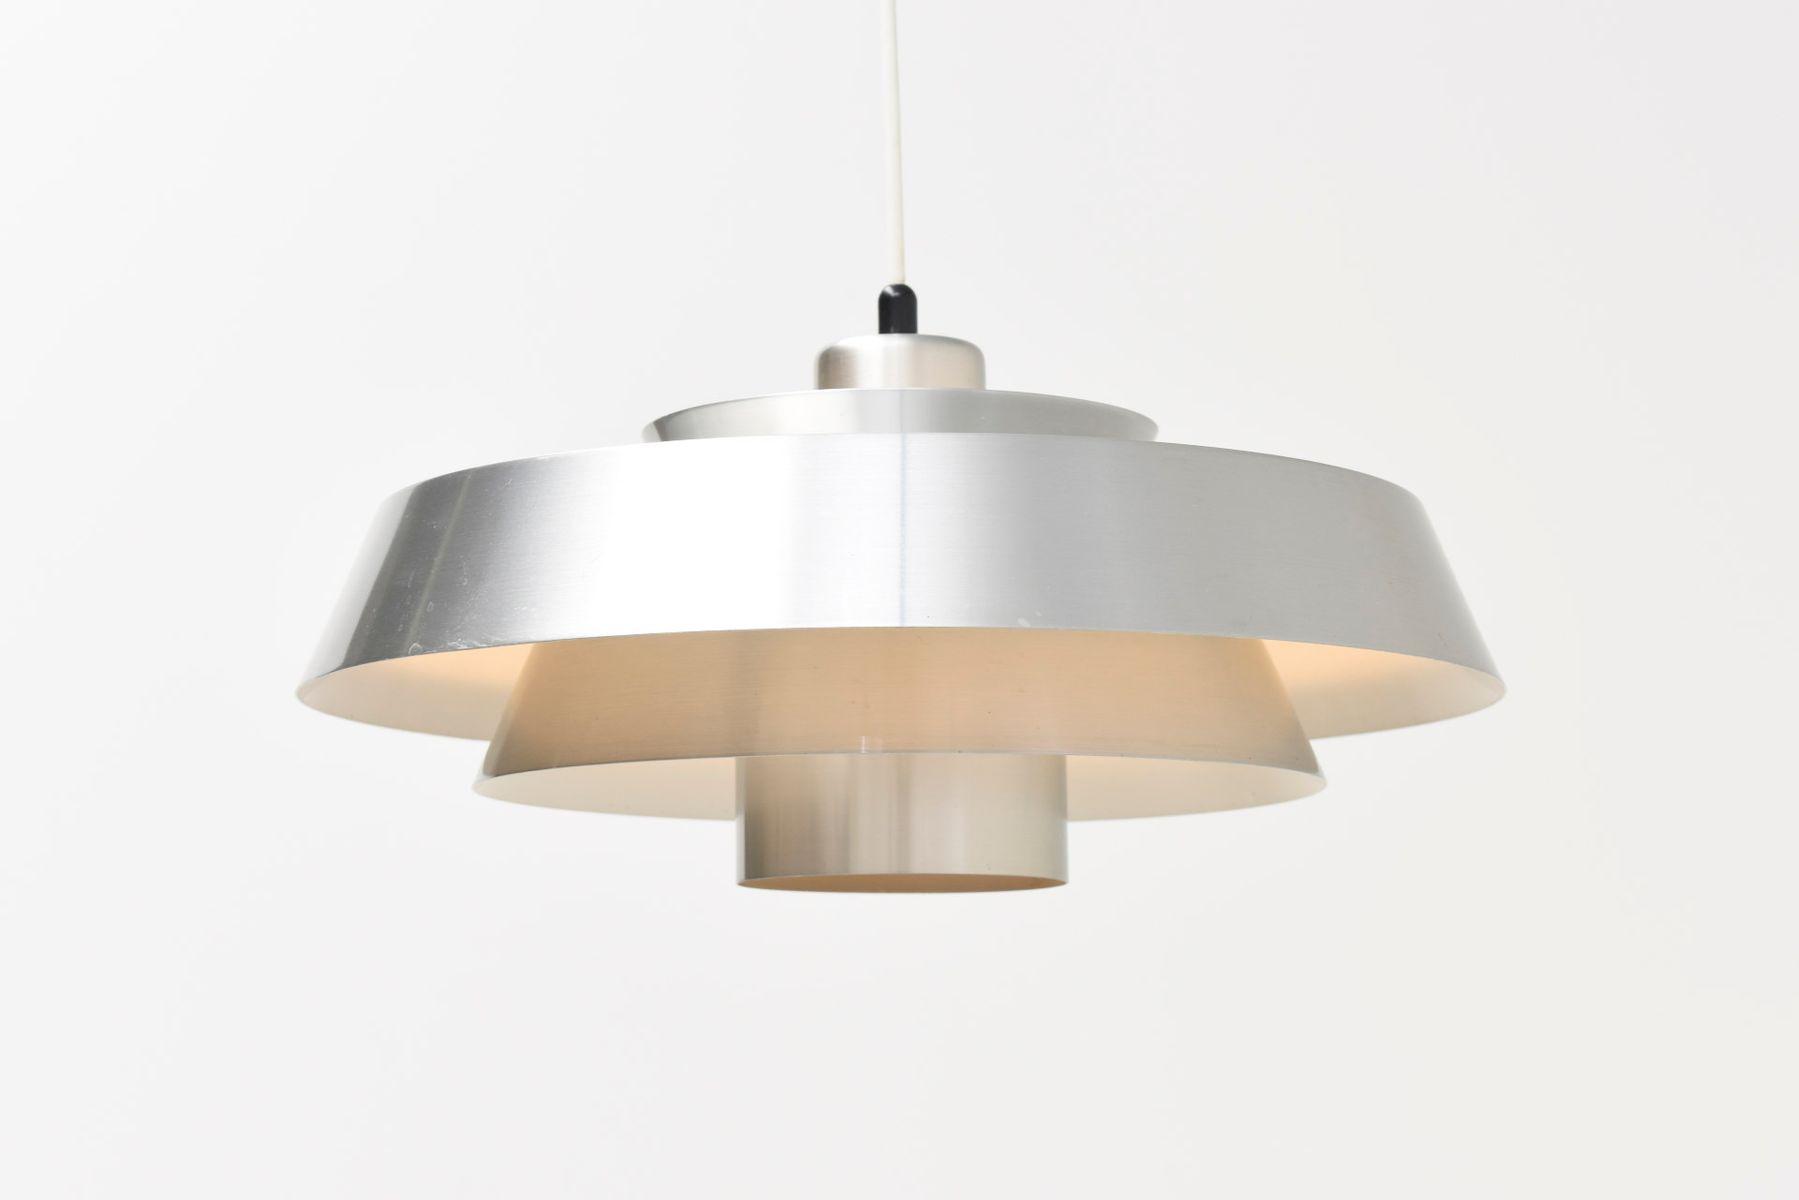 Vintage Nova Lampe aus Aluminium von Jo Hammerborg für Fog & Mørup